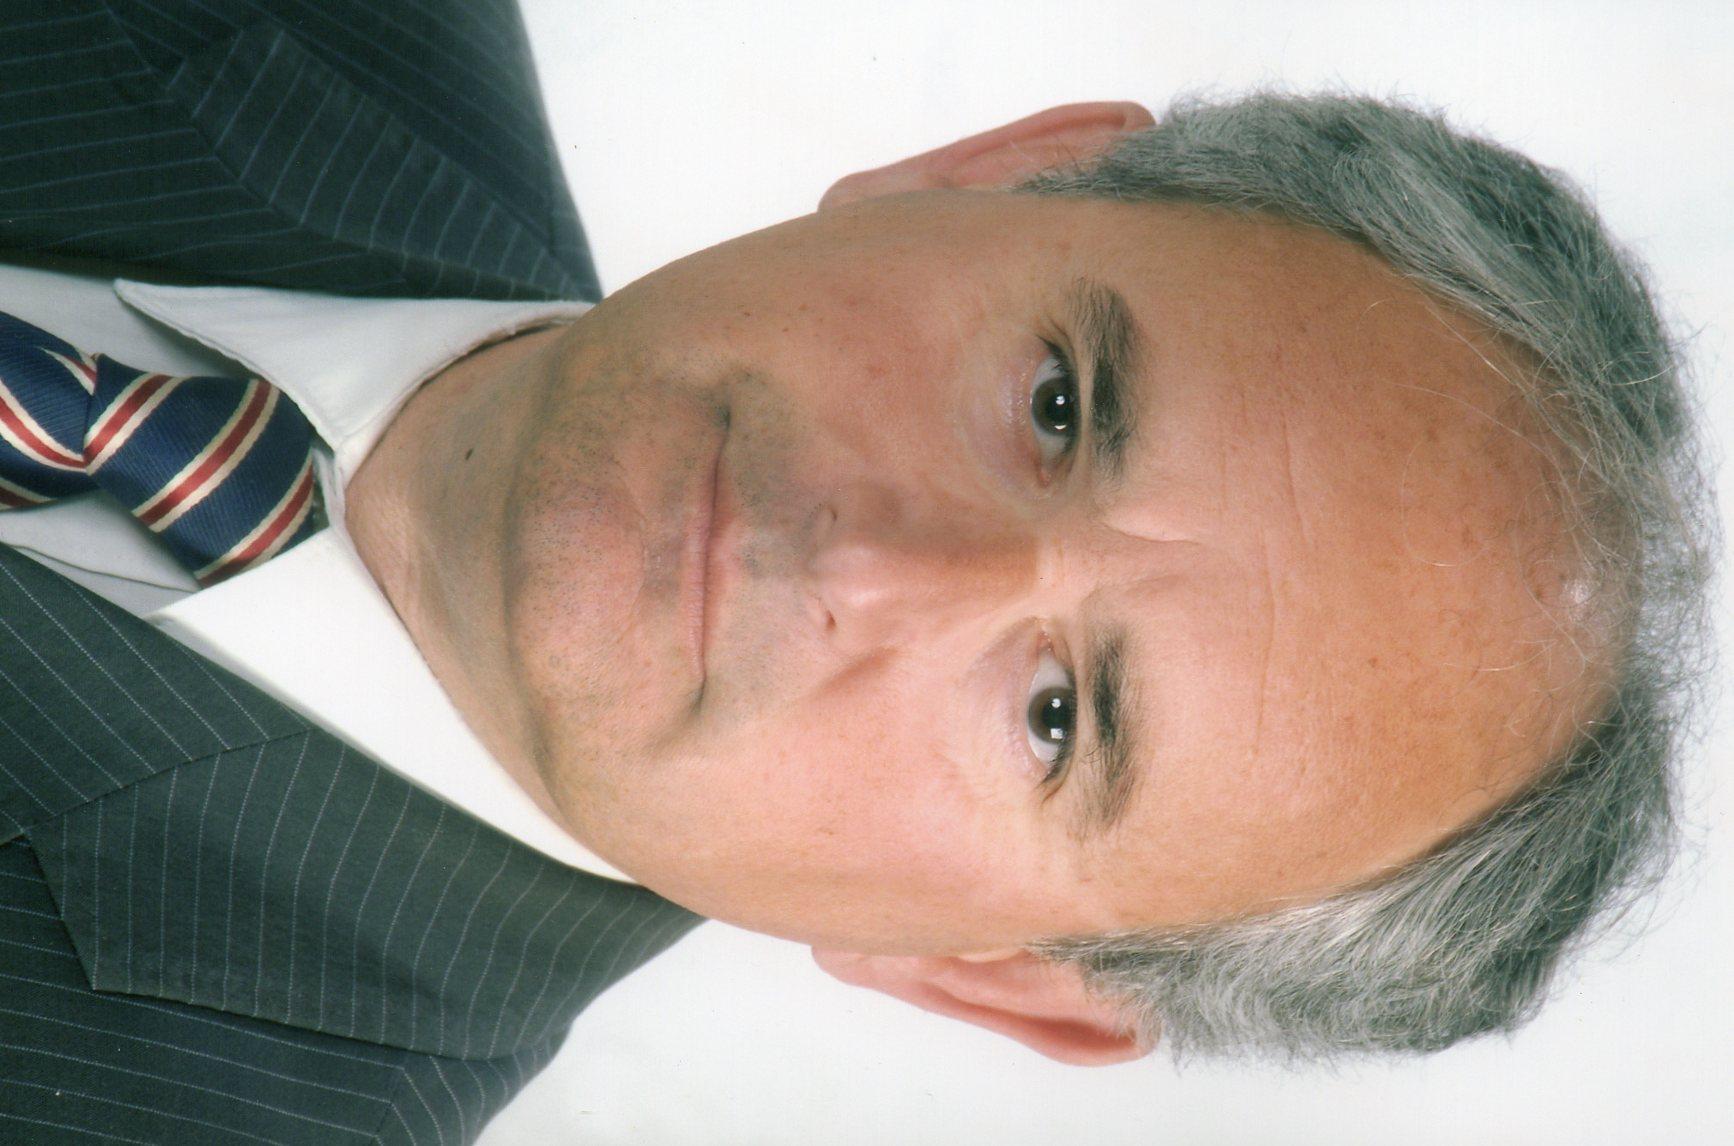 Francesco Iozzo